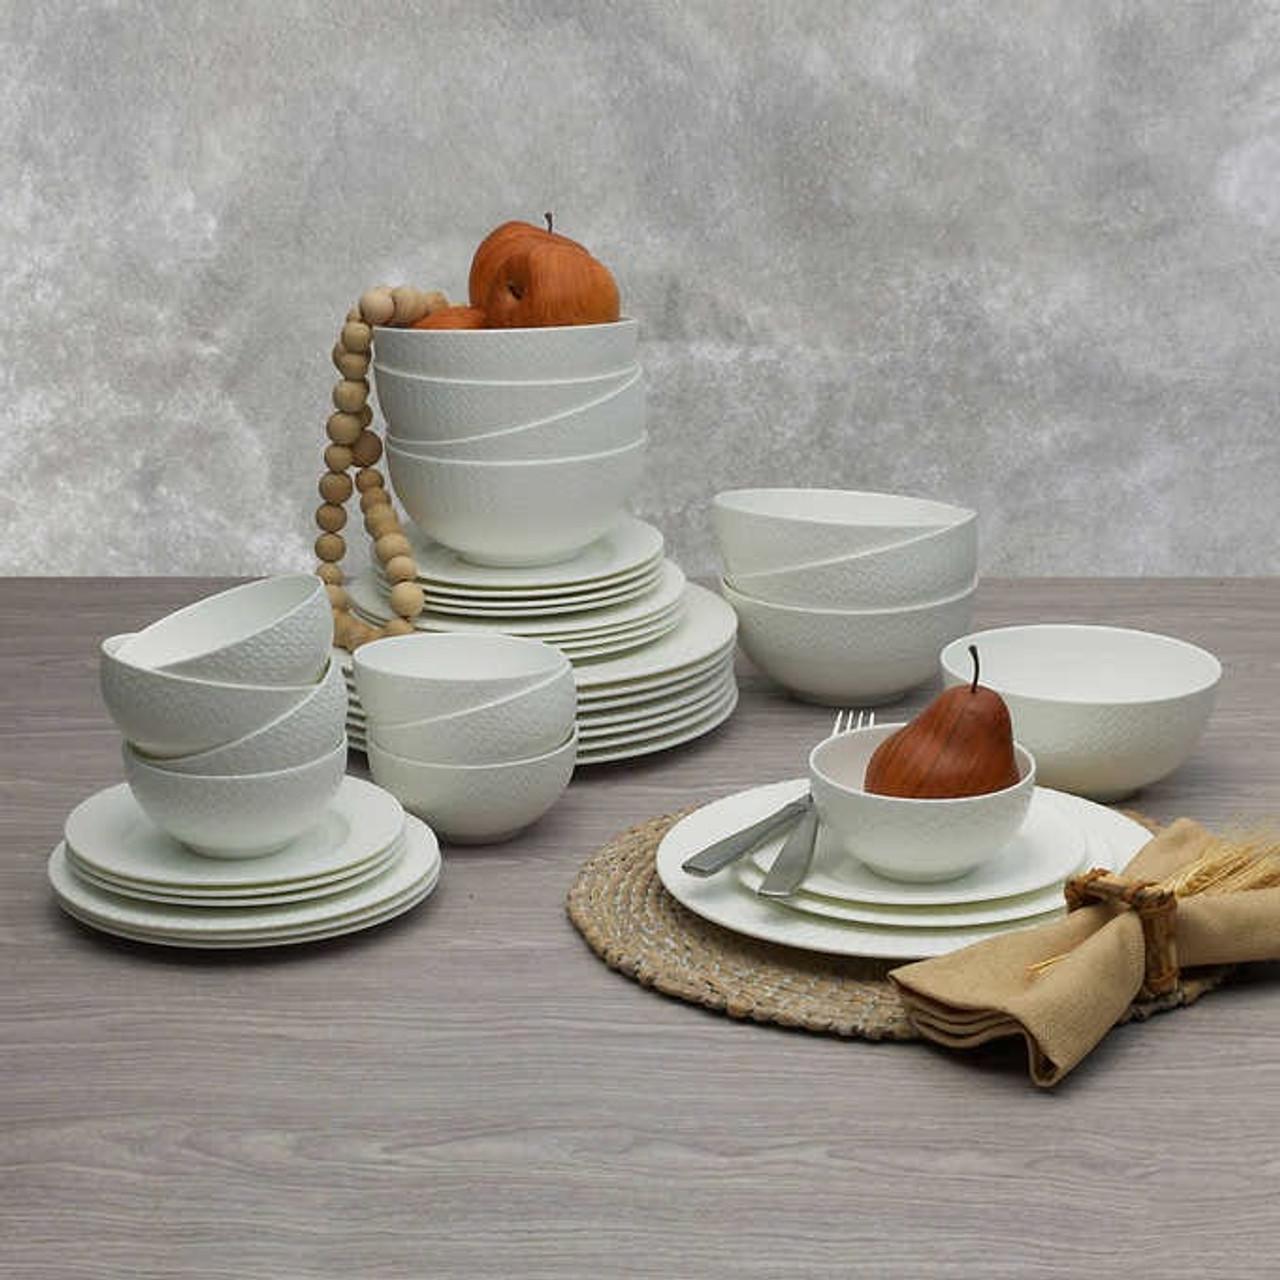 Mikasa Lattice 40 Piece Bone China Dinnerware Set American Glassware